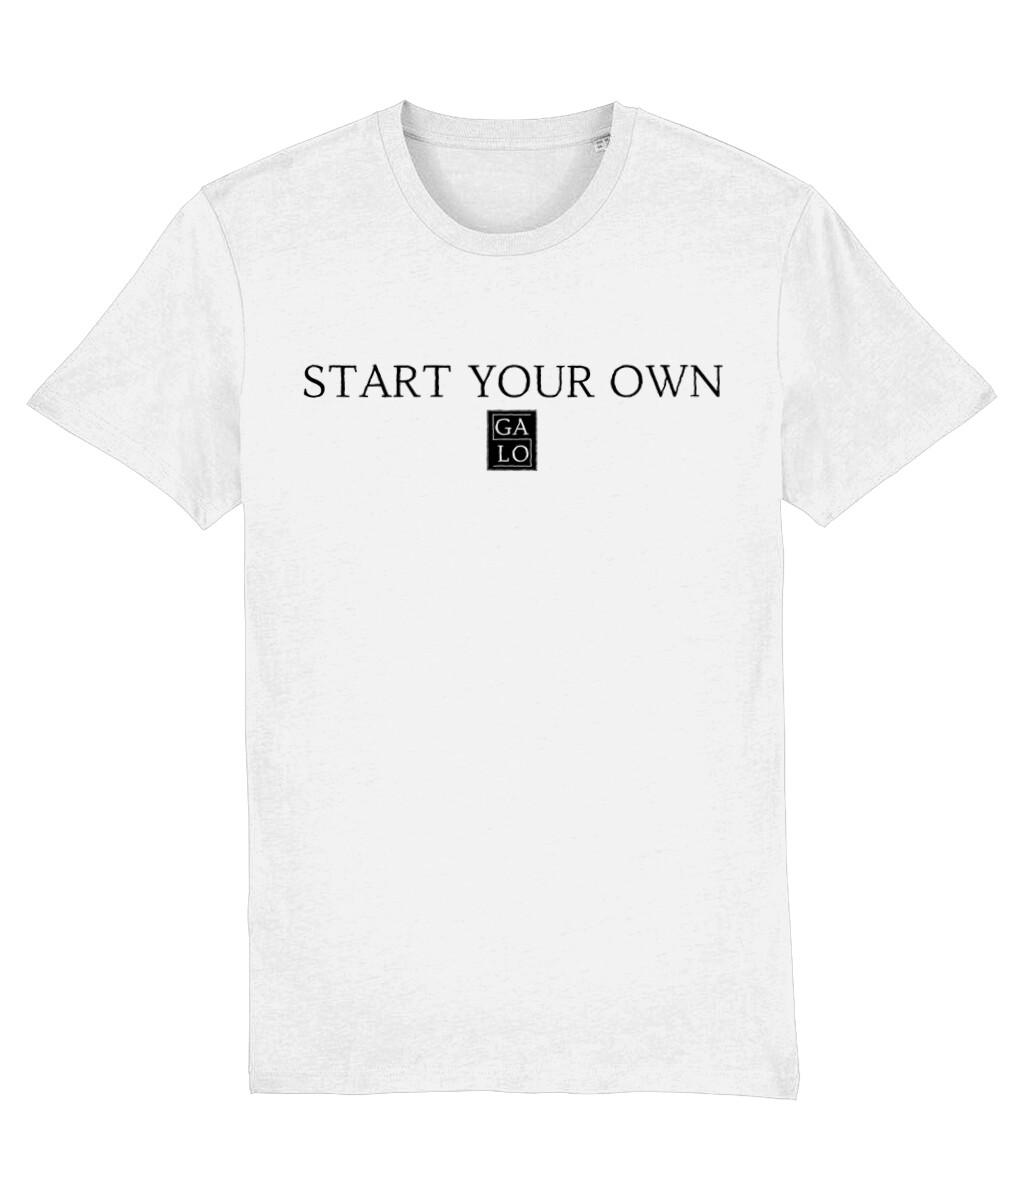 START YOUR OWN GALOS LOGO T-Shirt - White